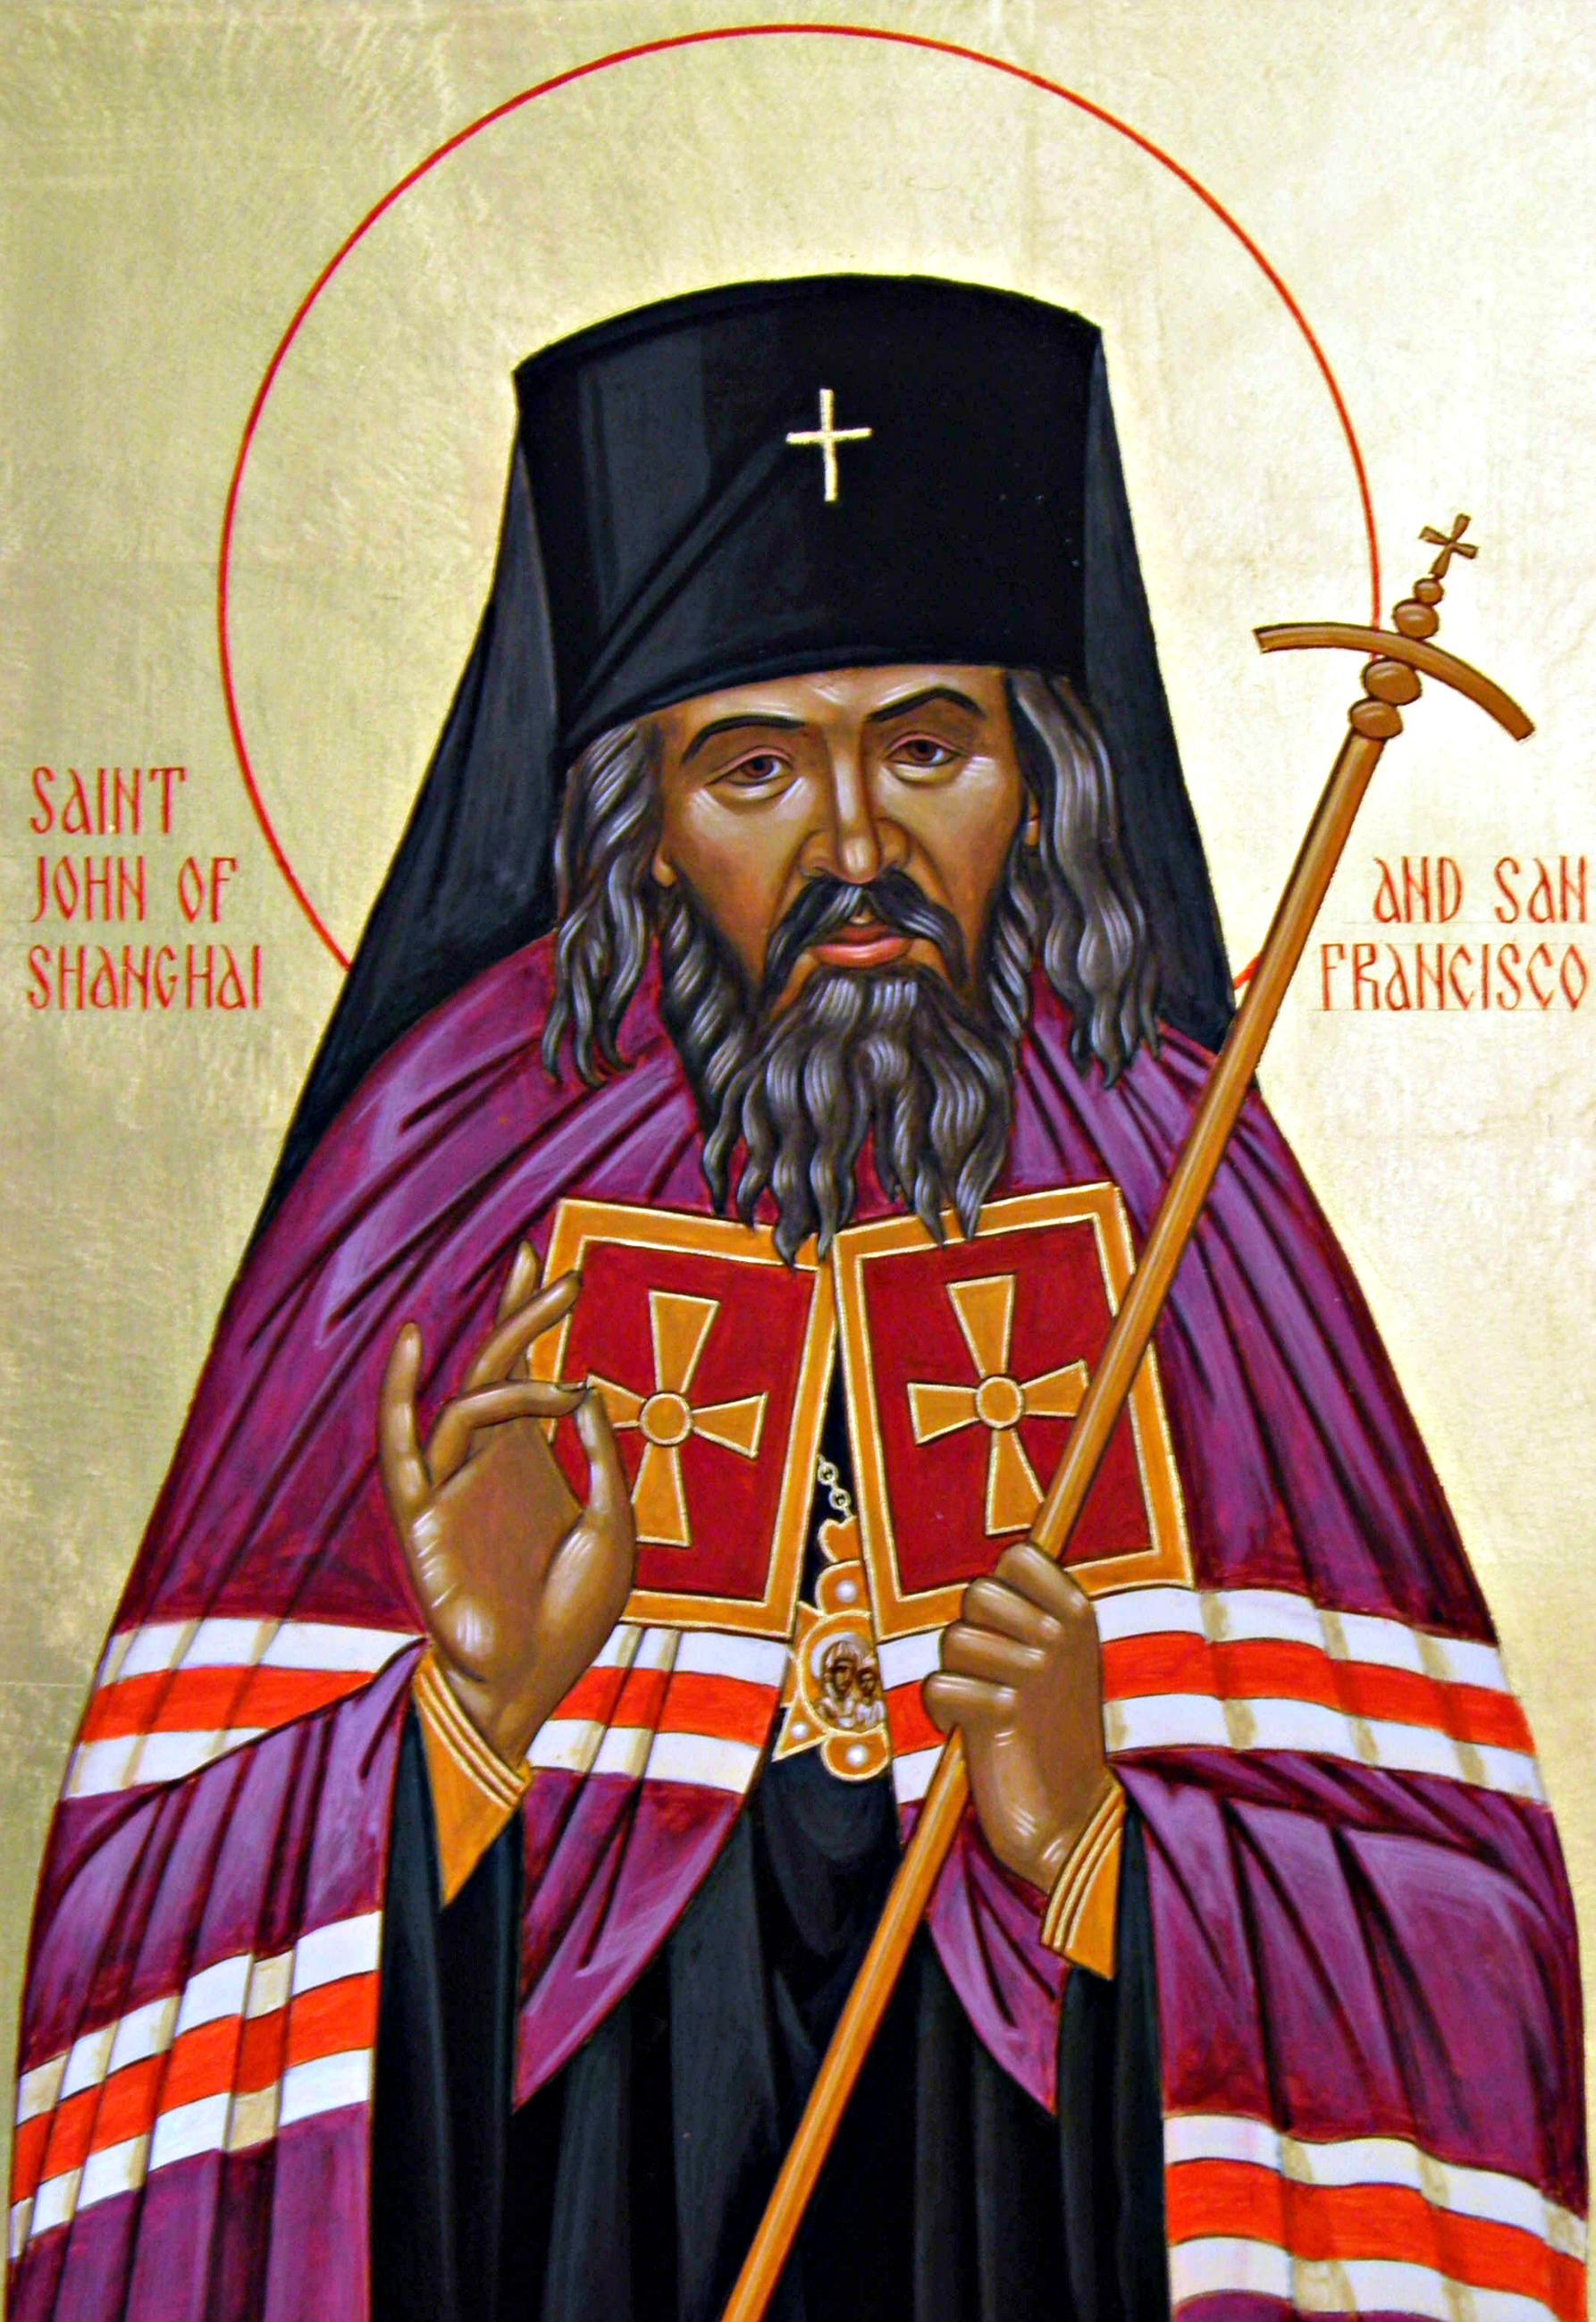 Saint John of Shanghai and San Francisco